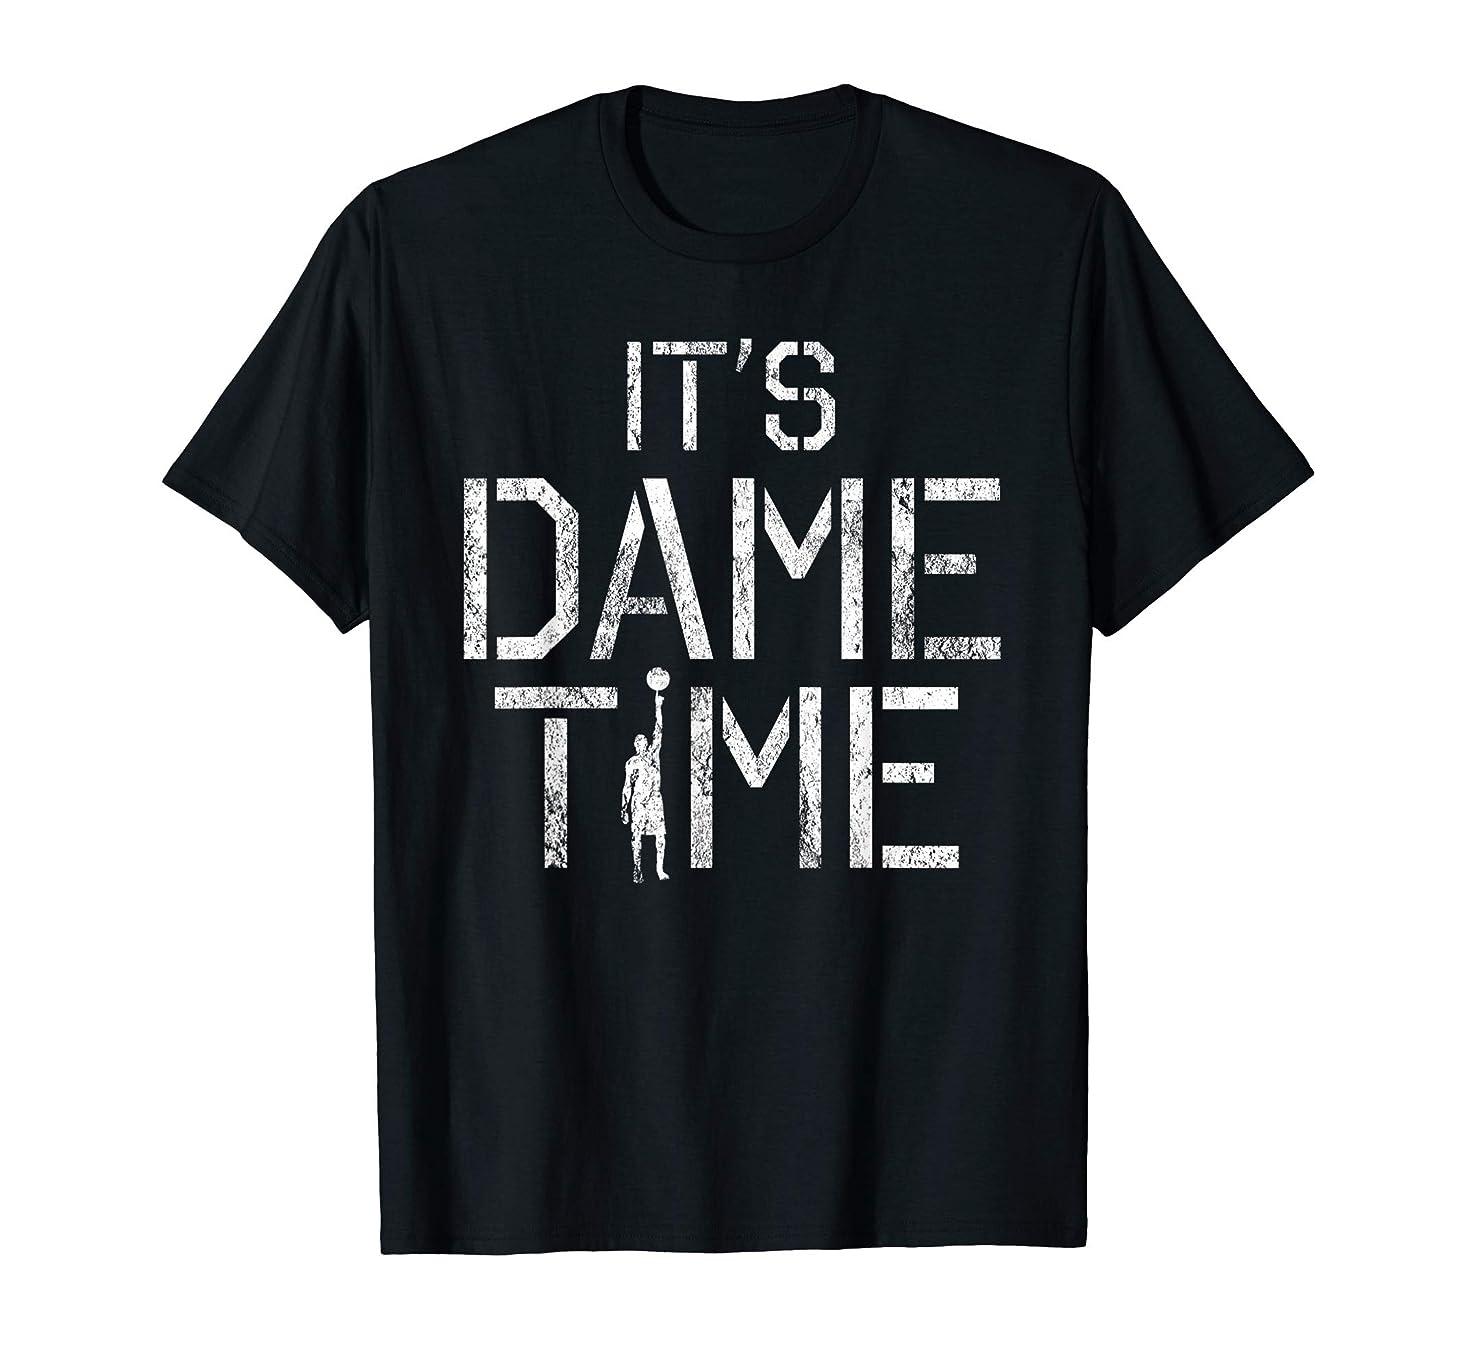 Portland Playoffs Time Fan Shirt